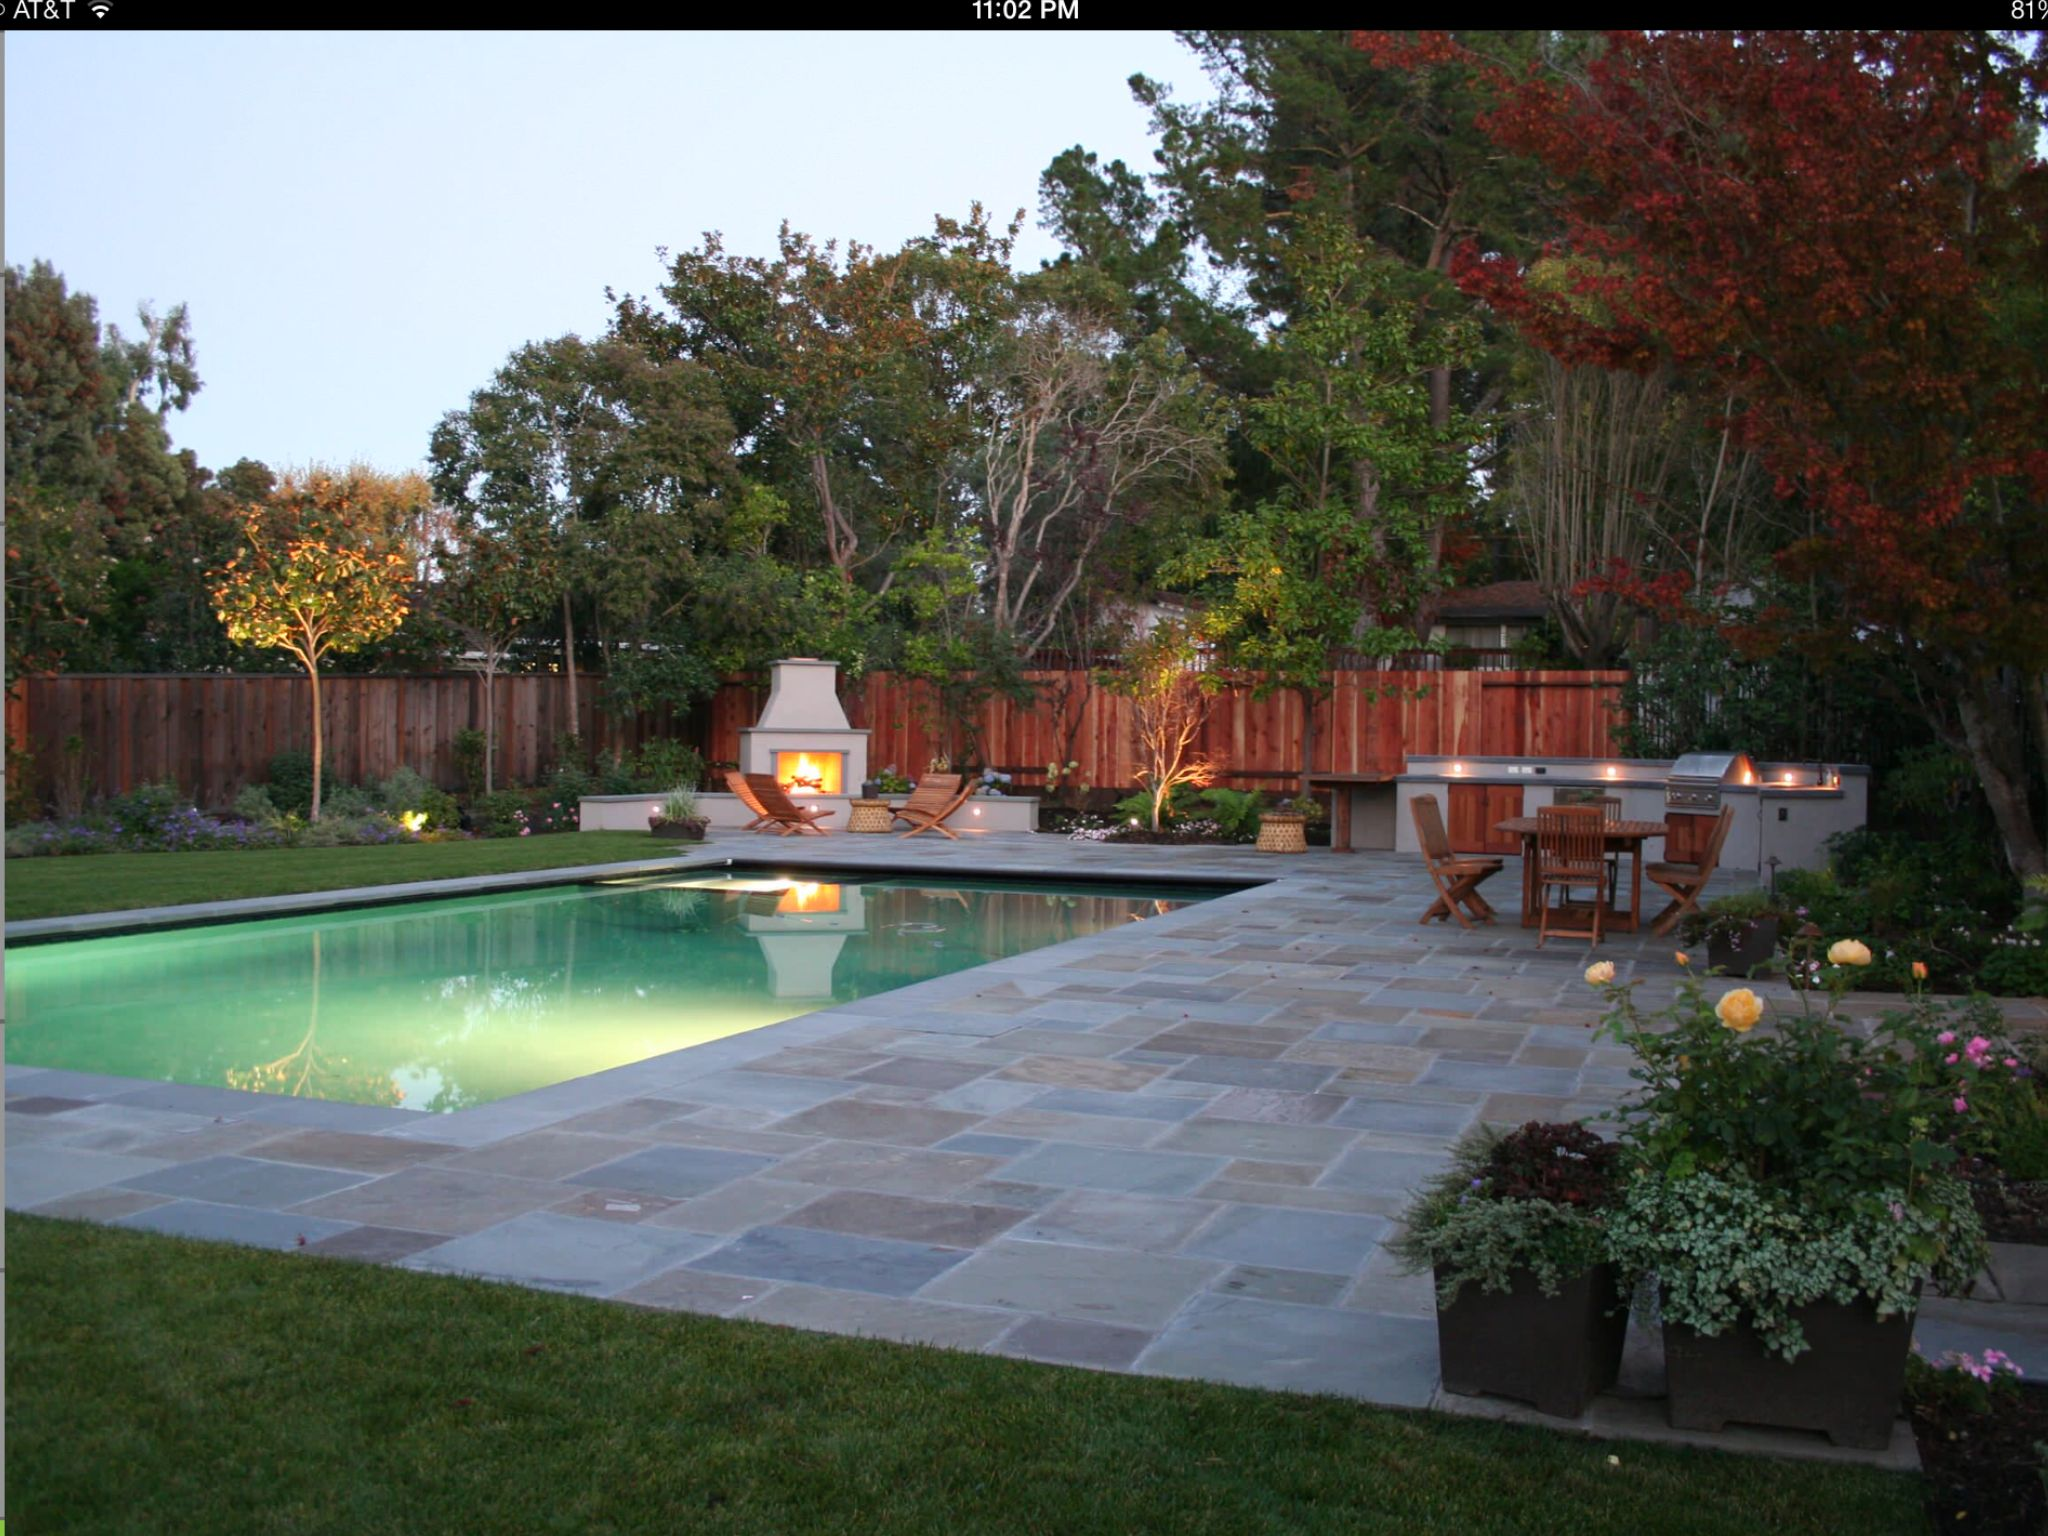 Pin by peter elana primbetov on pool pinterest outdoor spaces